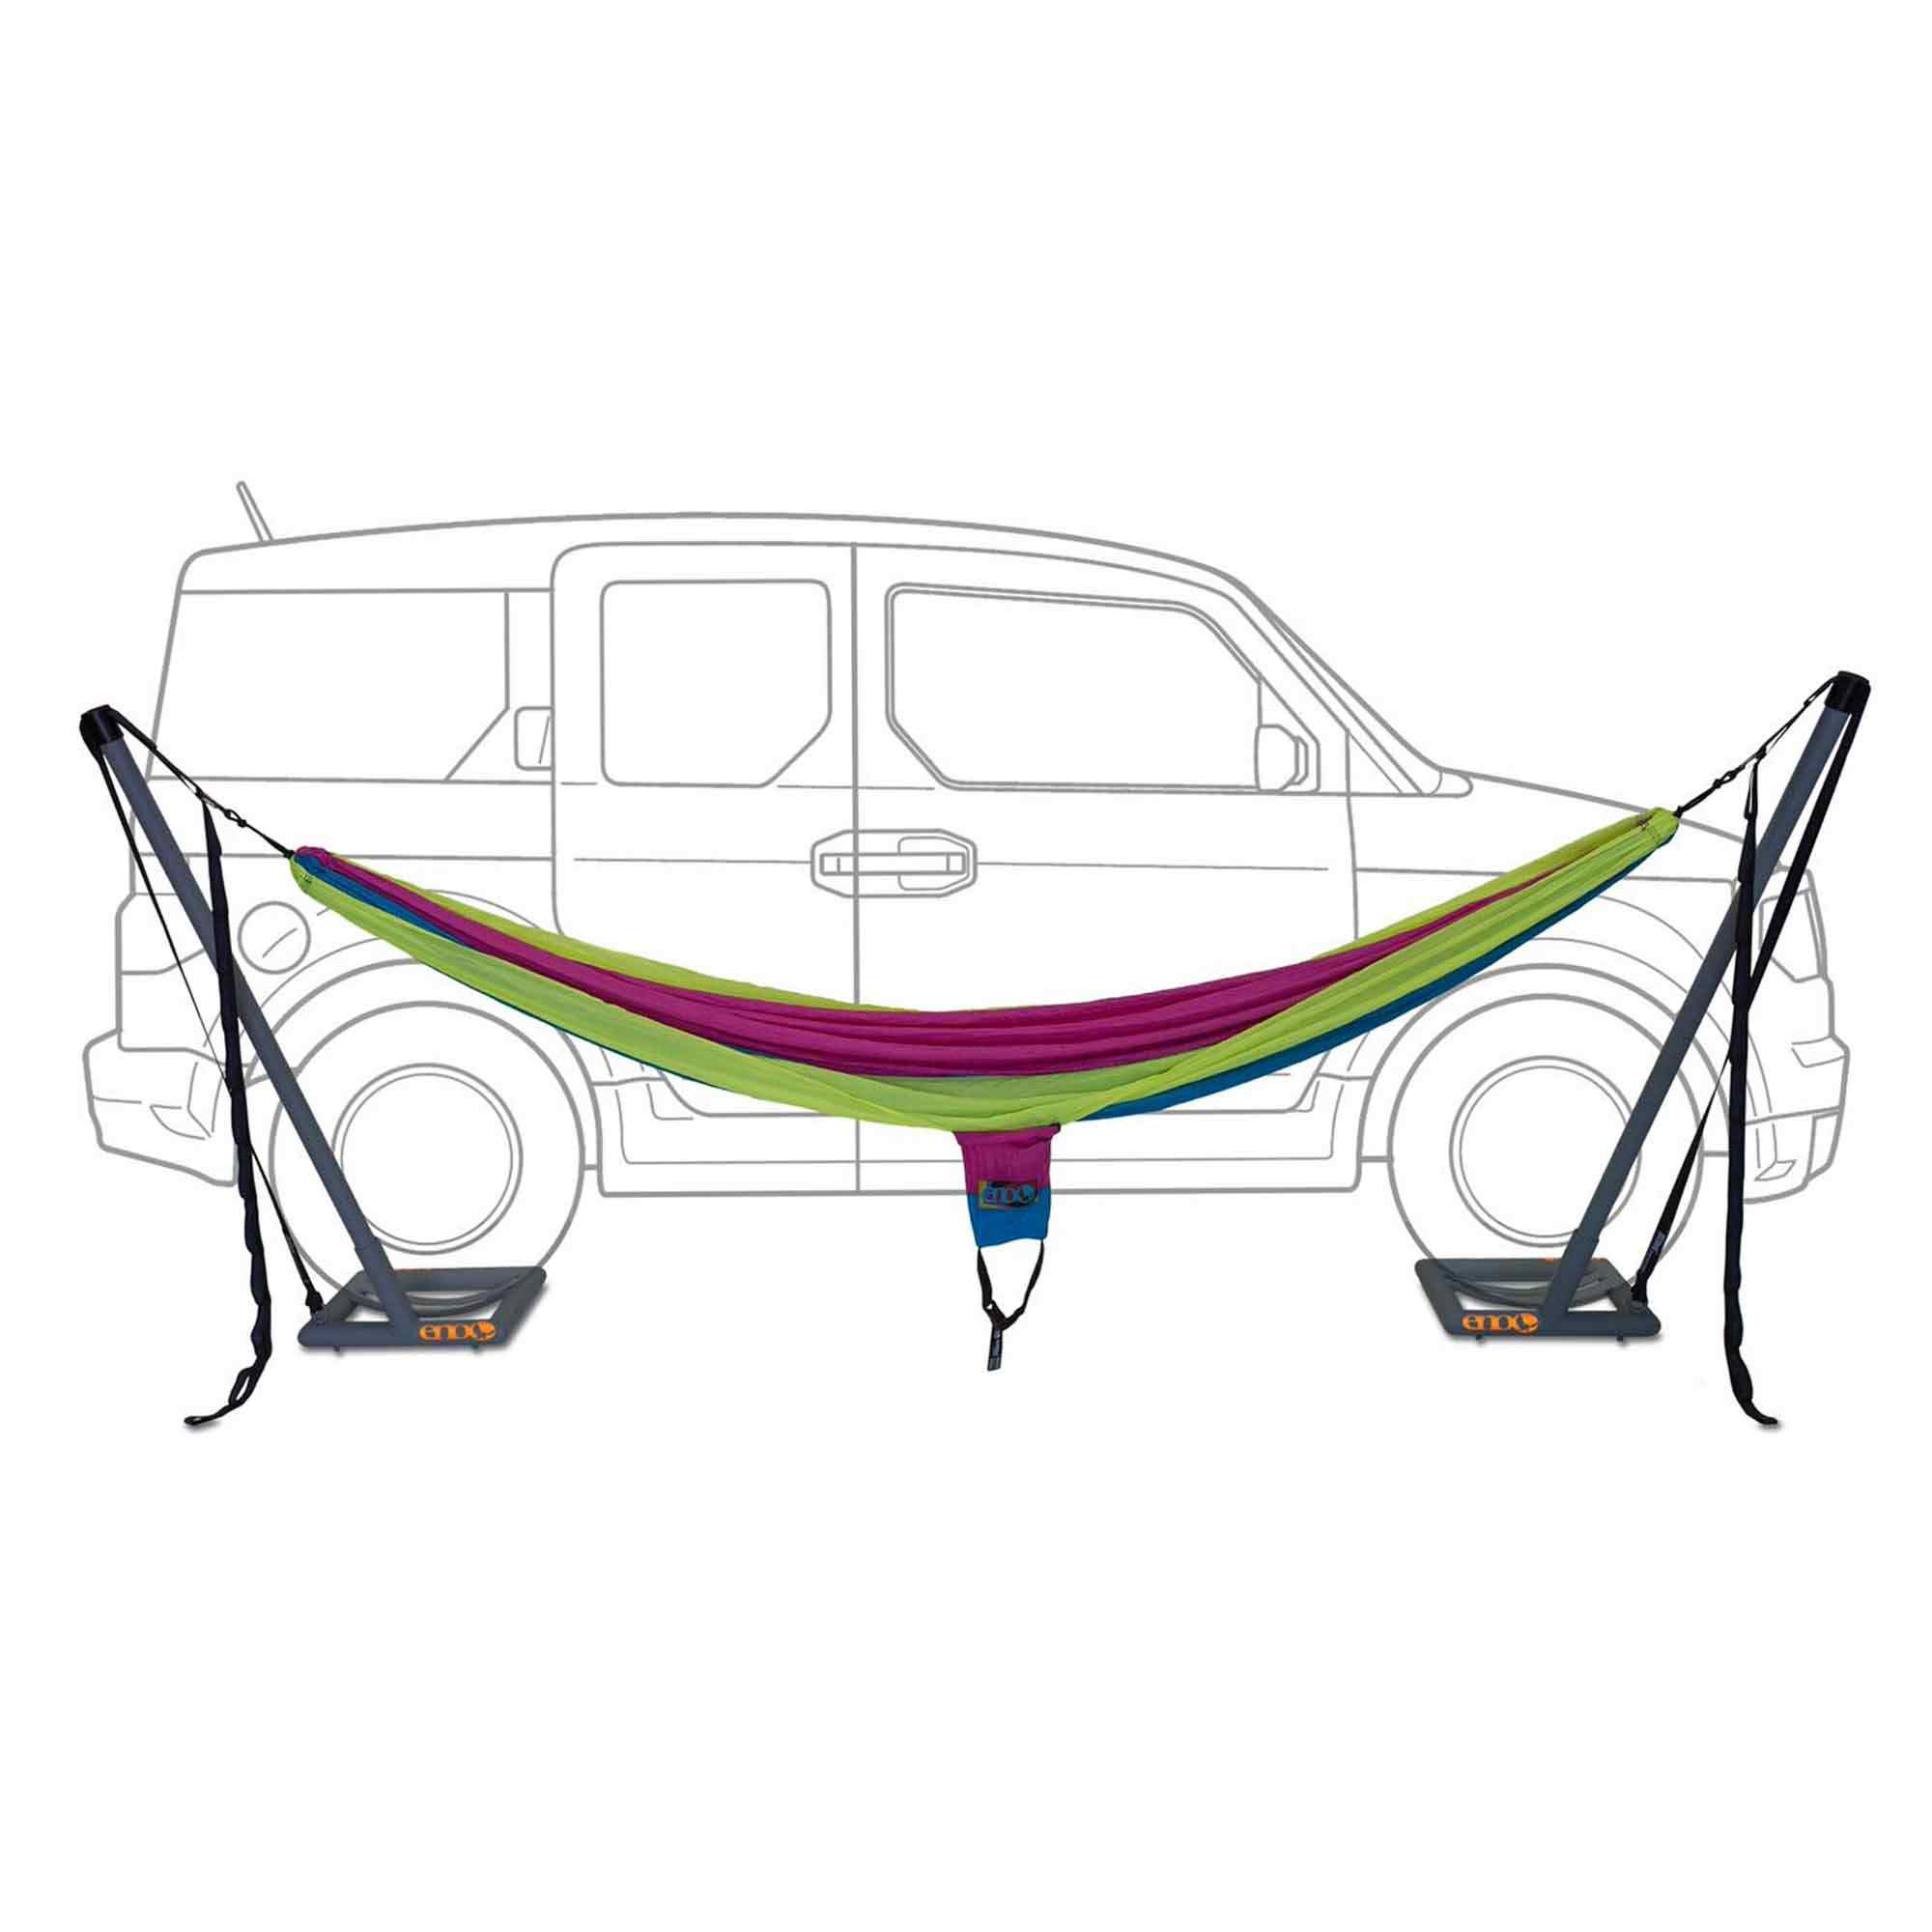 doublenest singlenest straps sale hammock portable eno cheap purple stand ebay amazon rei